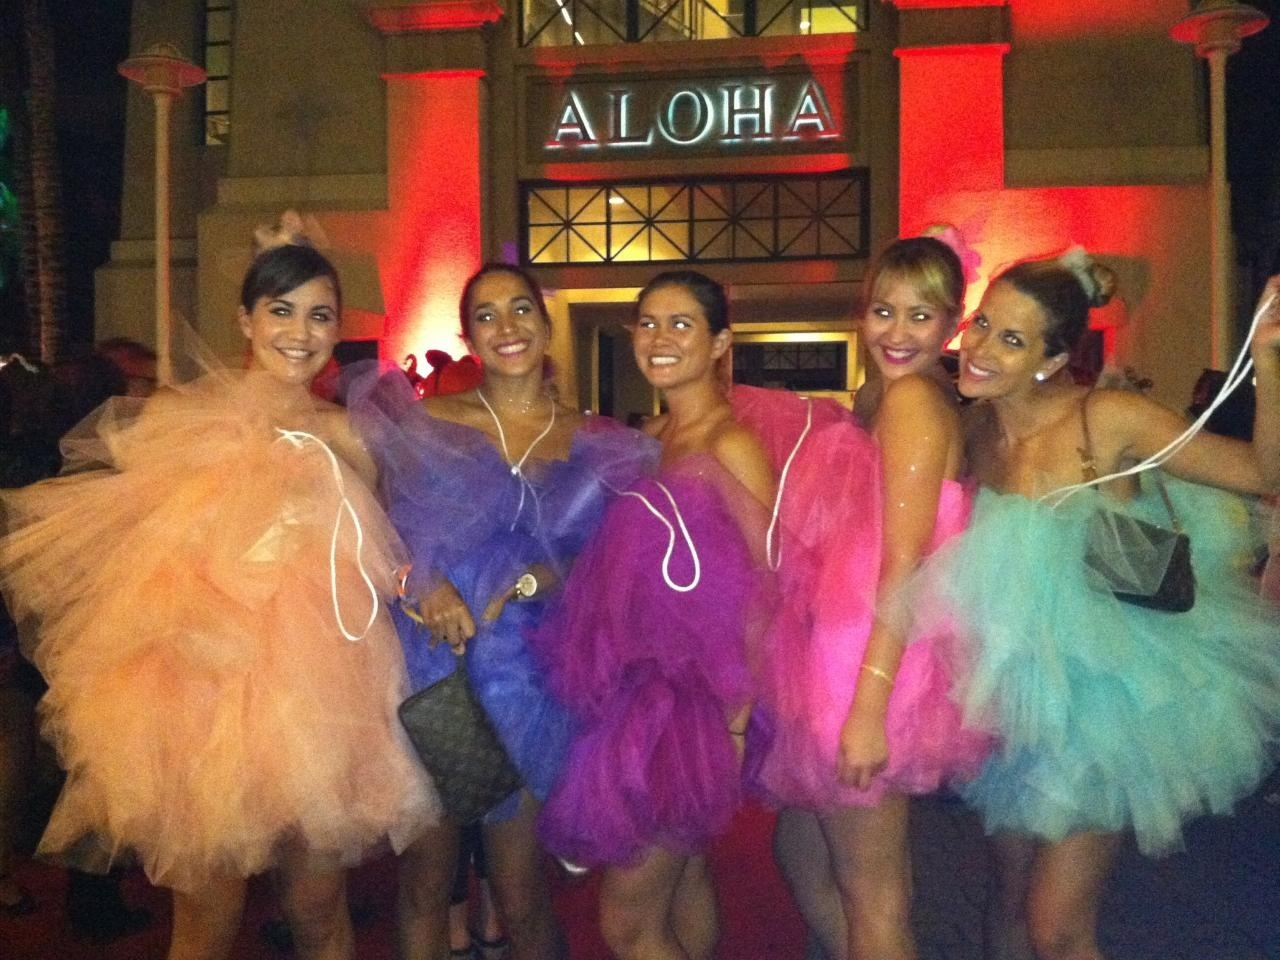 Halloween costumes hawaii fashion fiend loofahcostumehalloween keeping halloween costumes clean one loofah solutioingenieria Image collections